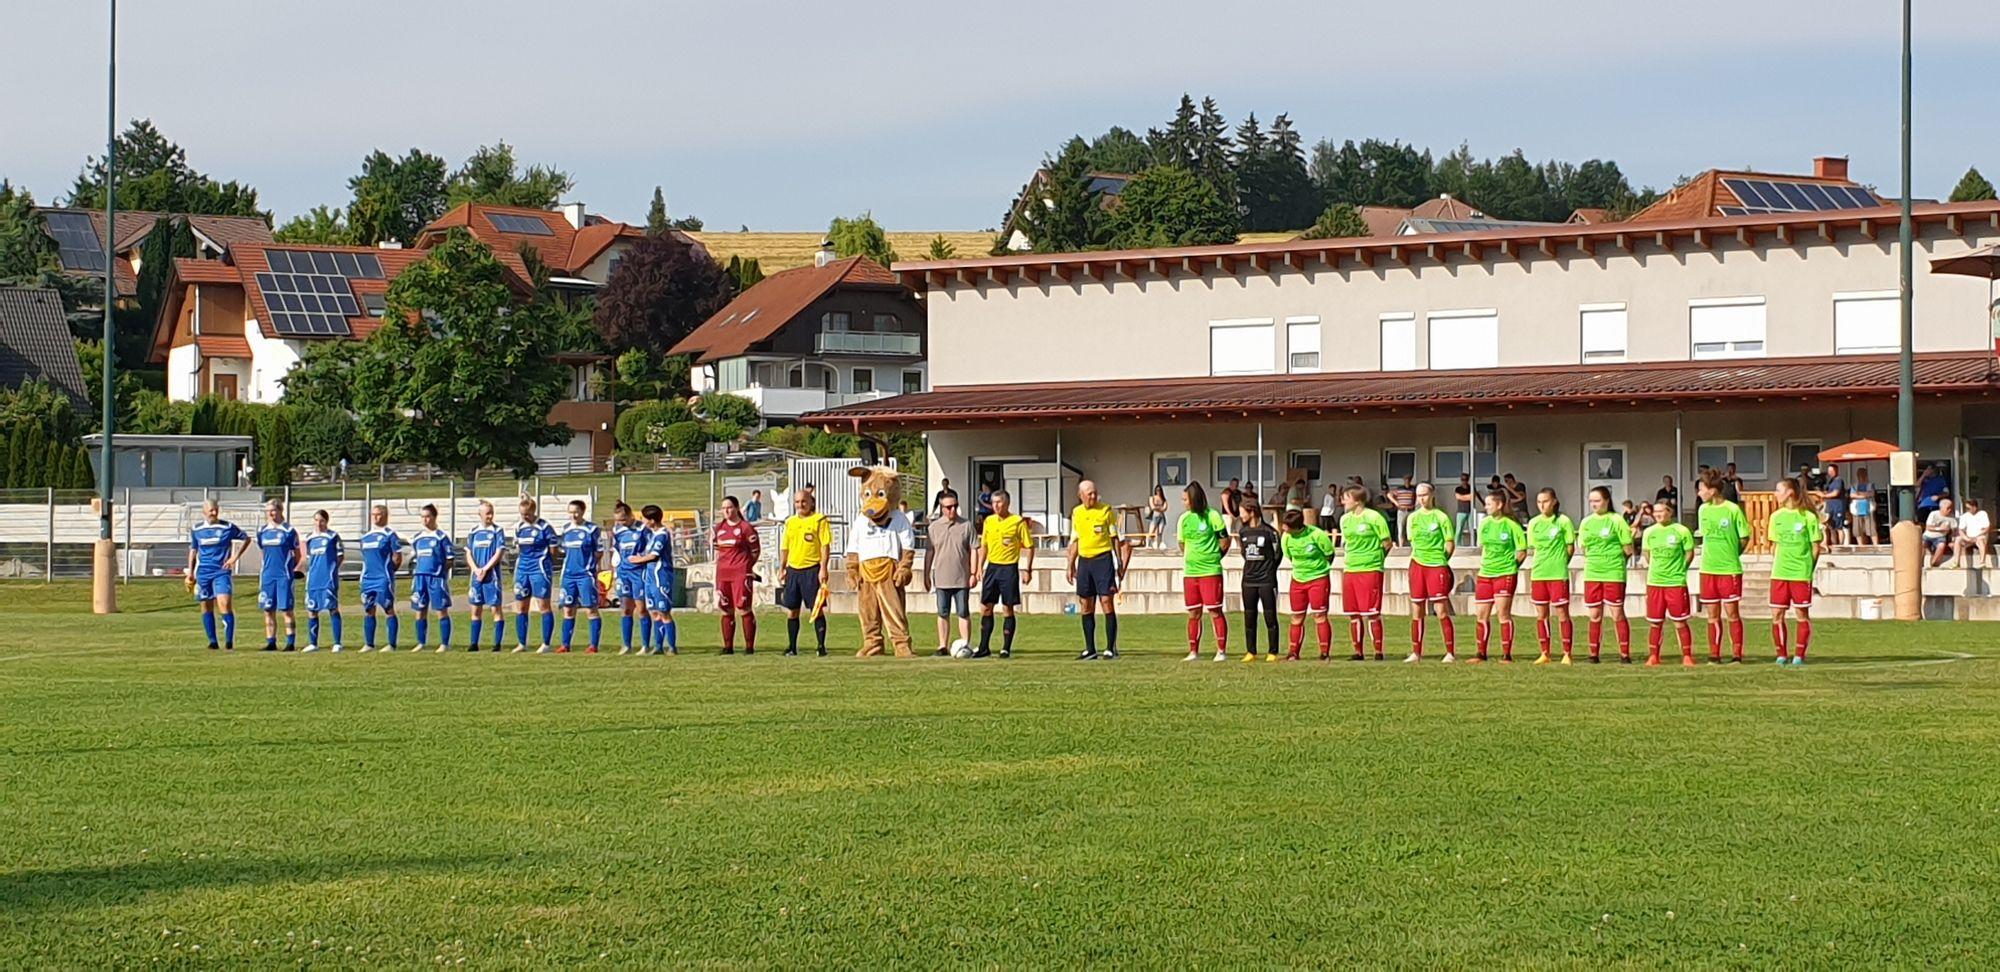 Match in Krenglbach sponsored by Conpex